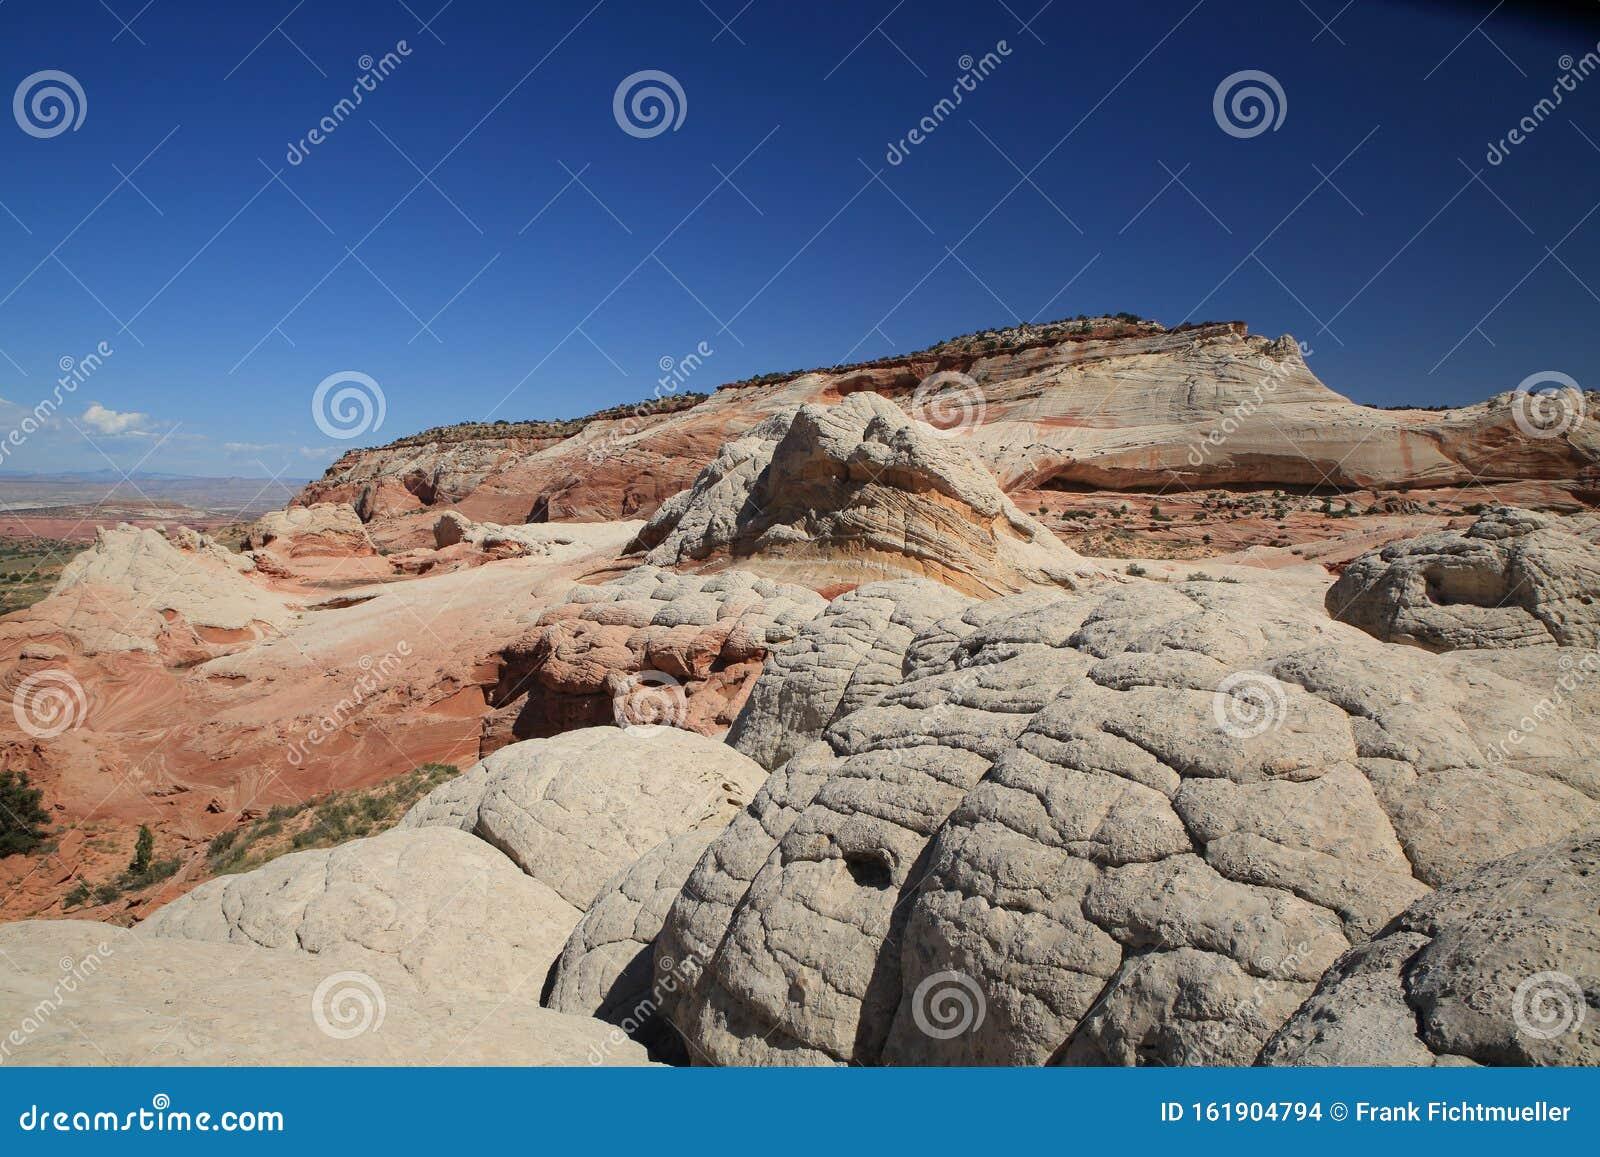 Vermillion Cliffs In Arizona Stock Image - Image of